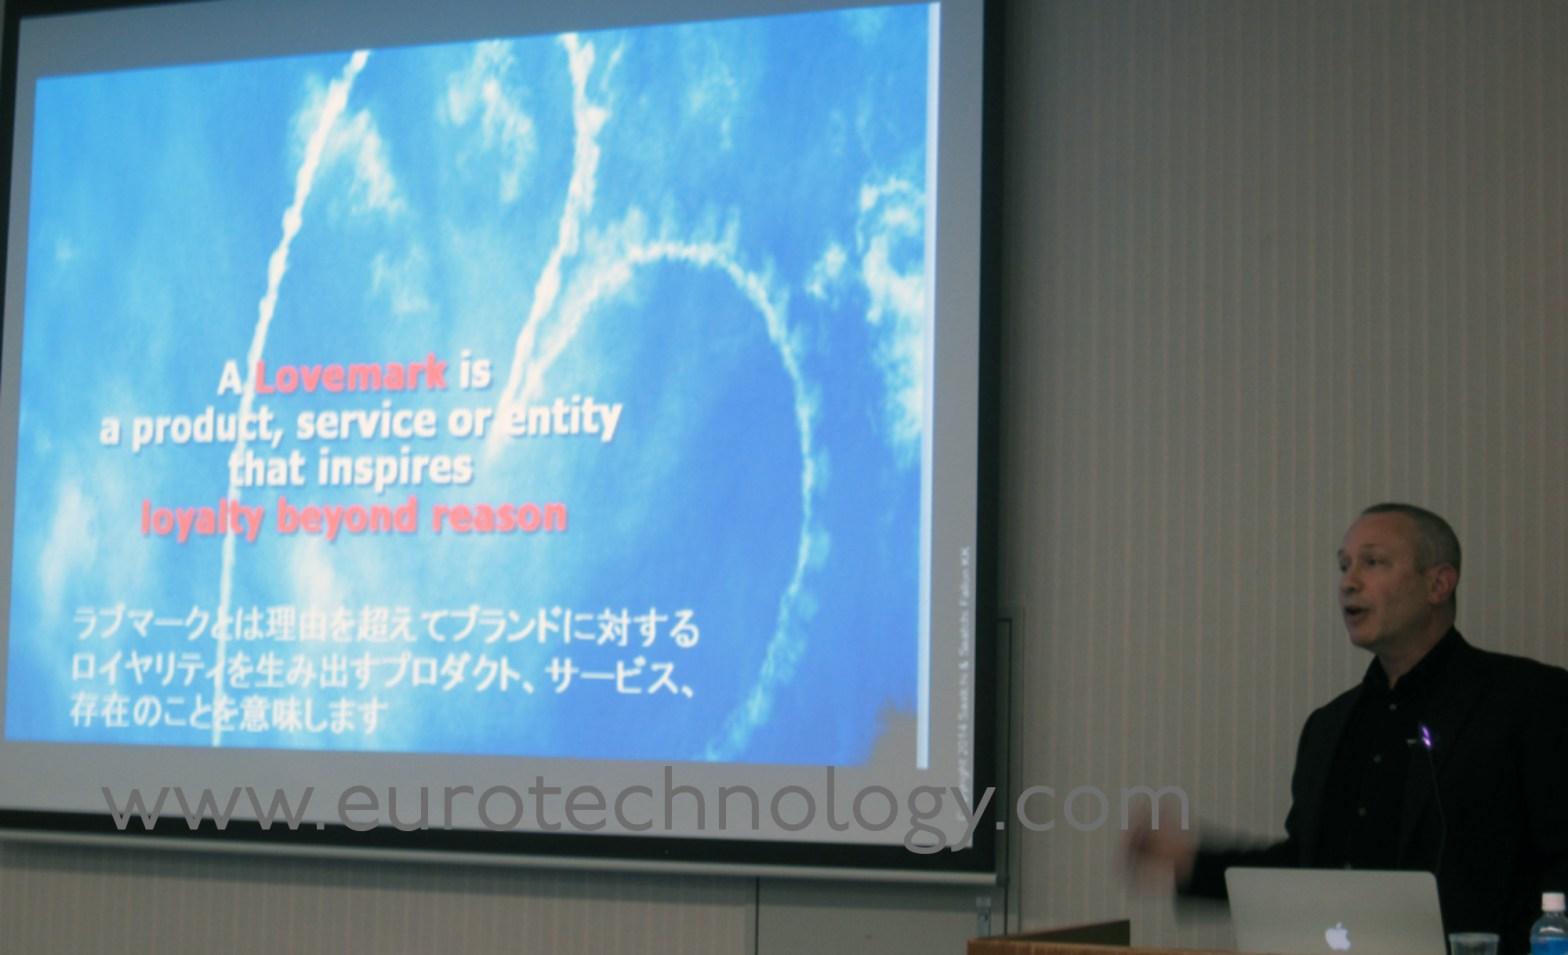 saatchi & saatchi eurotechnology.com